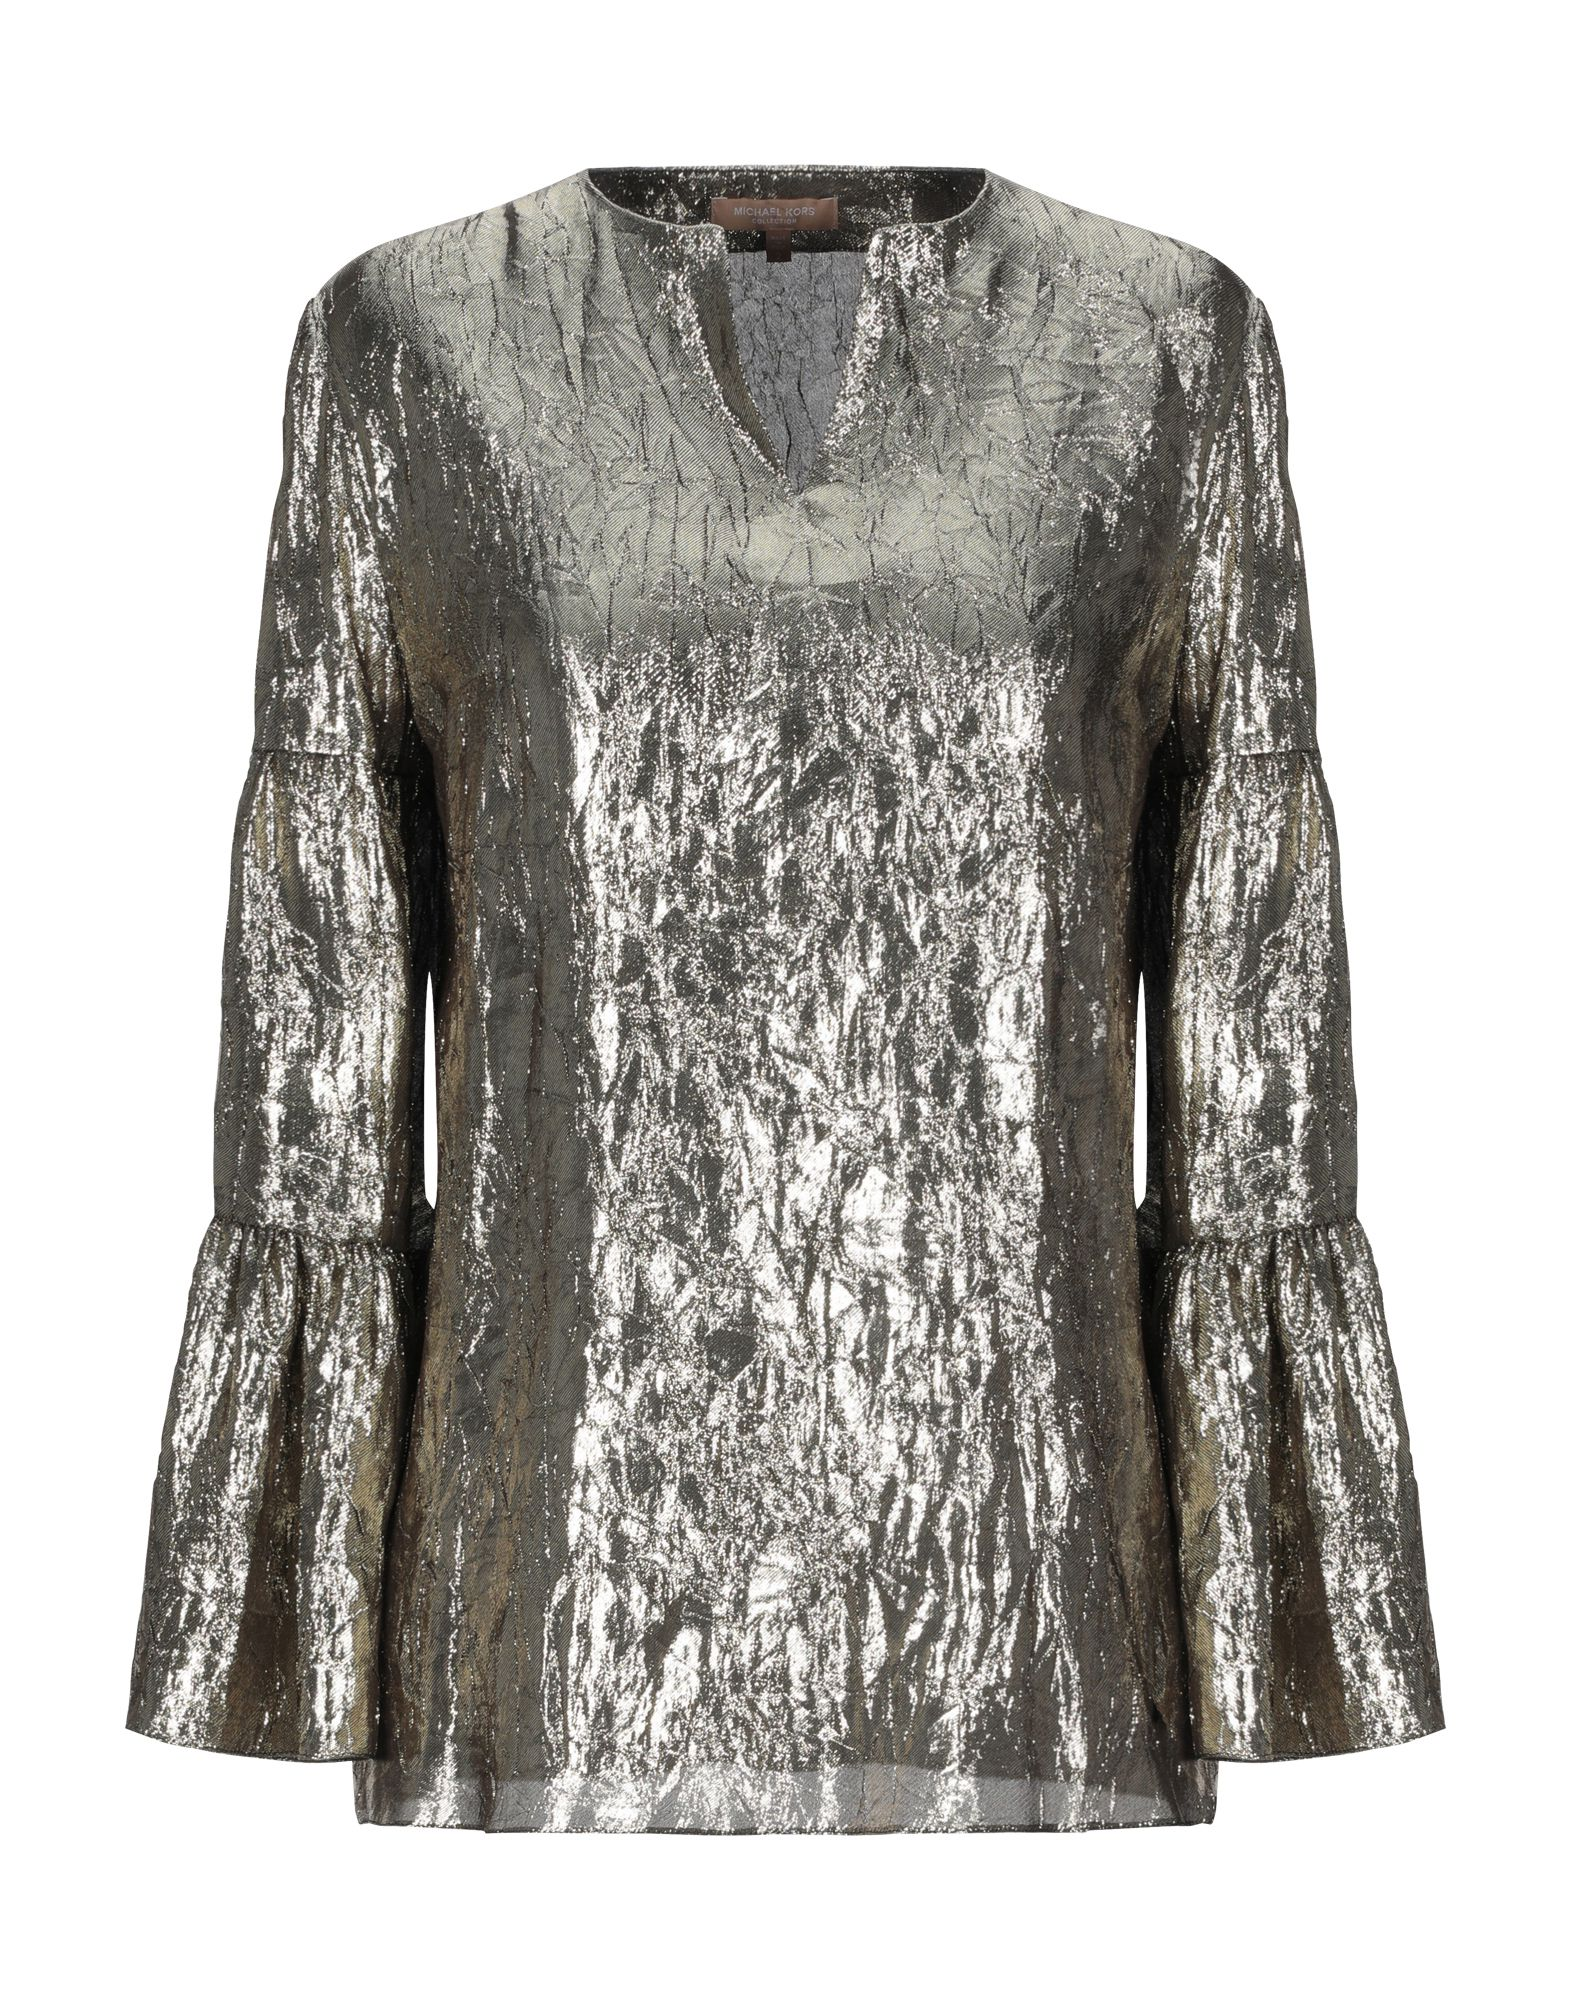 michael kors collection блузка MICHAEL KORS COLLECTION Блузка